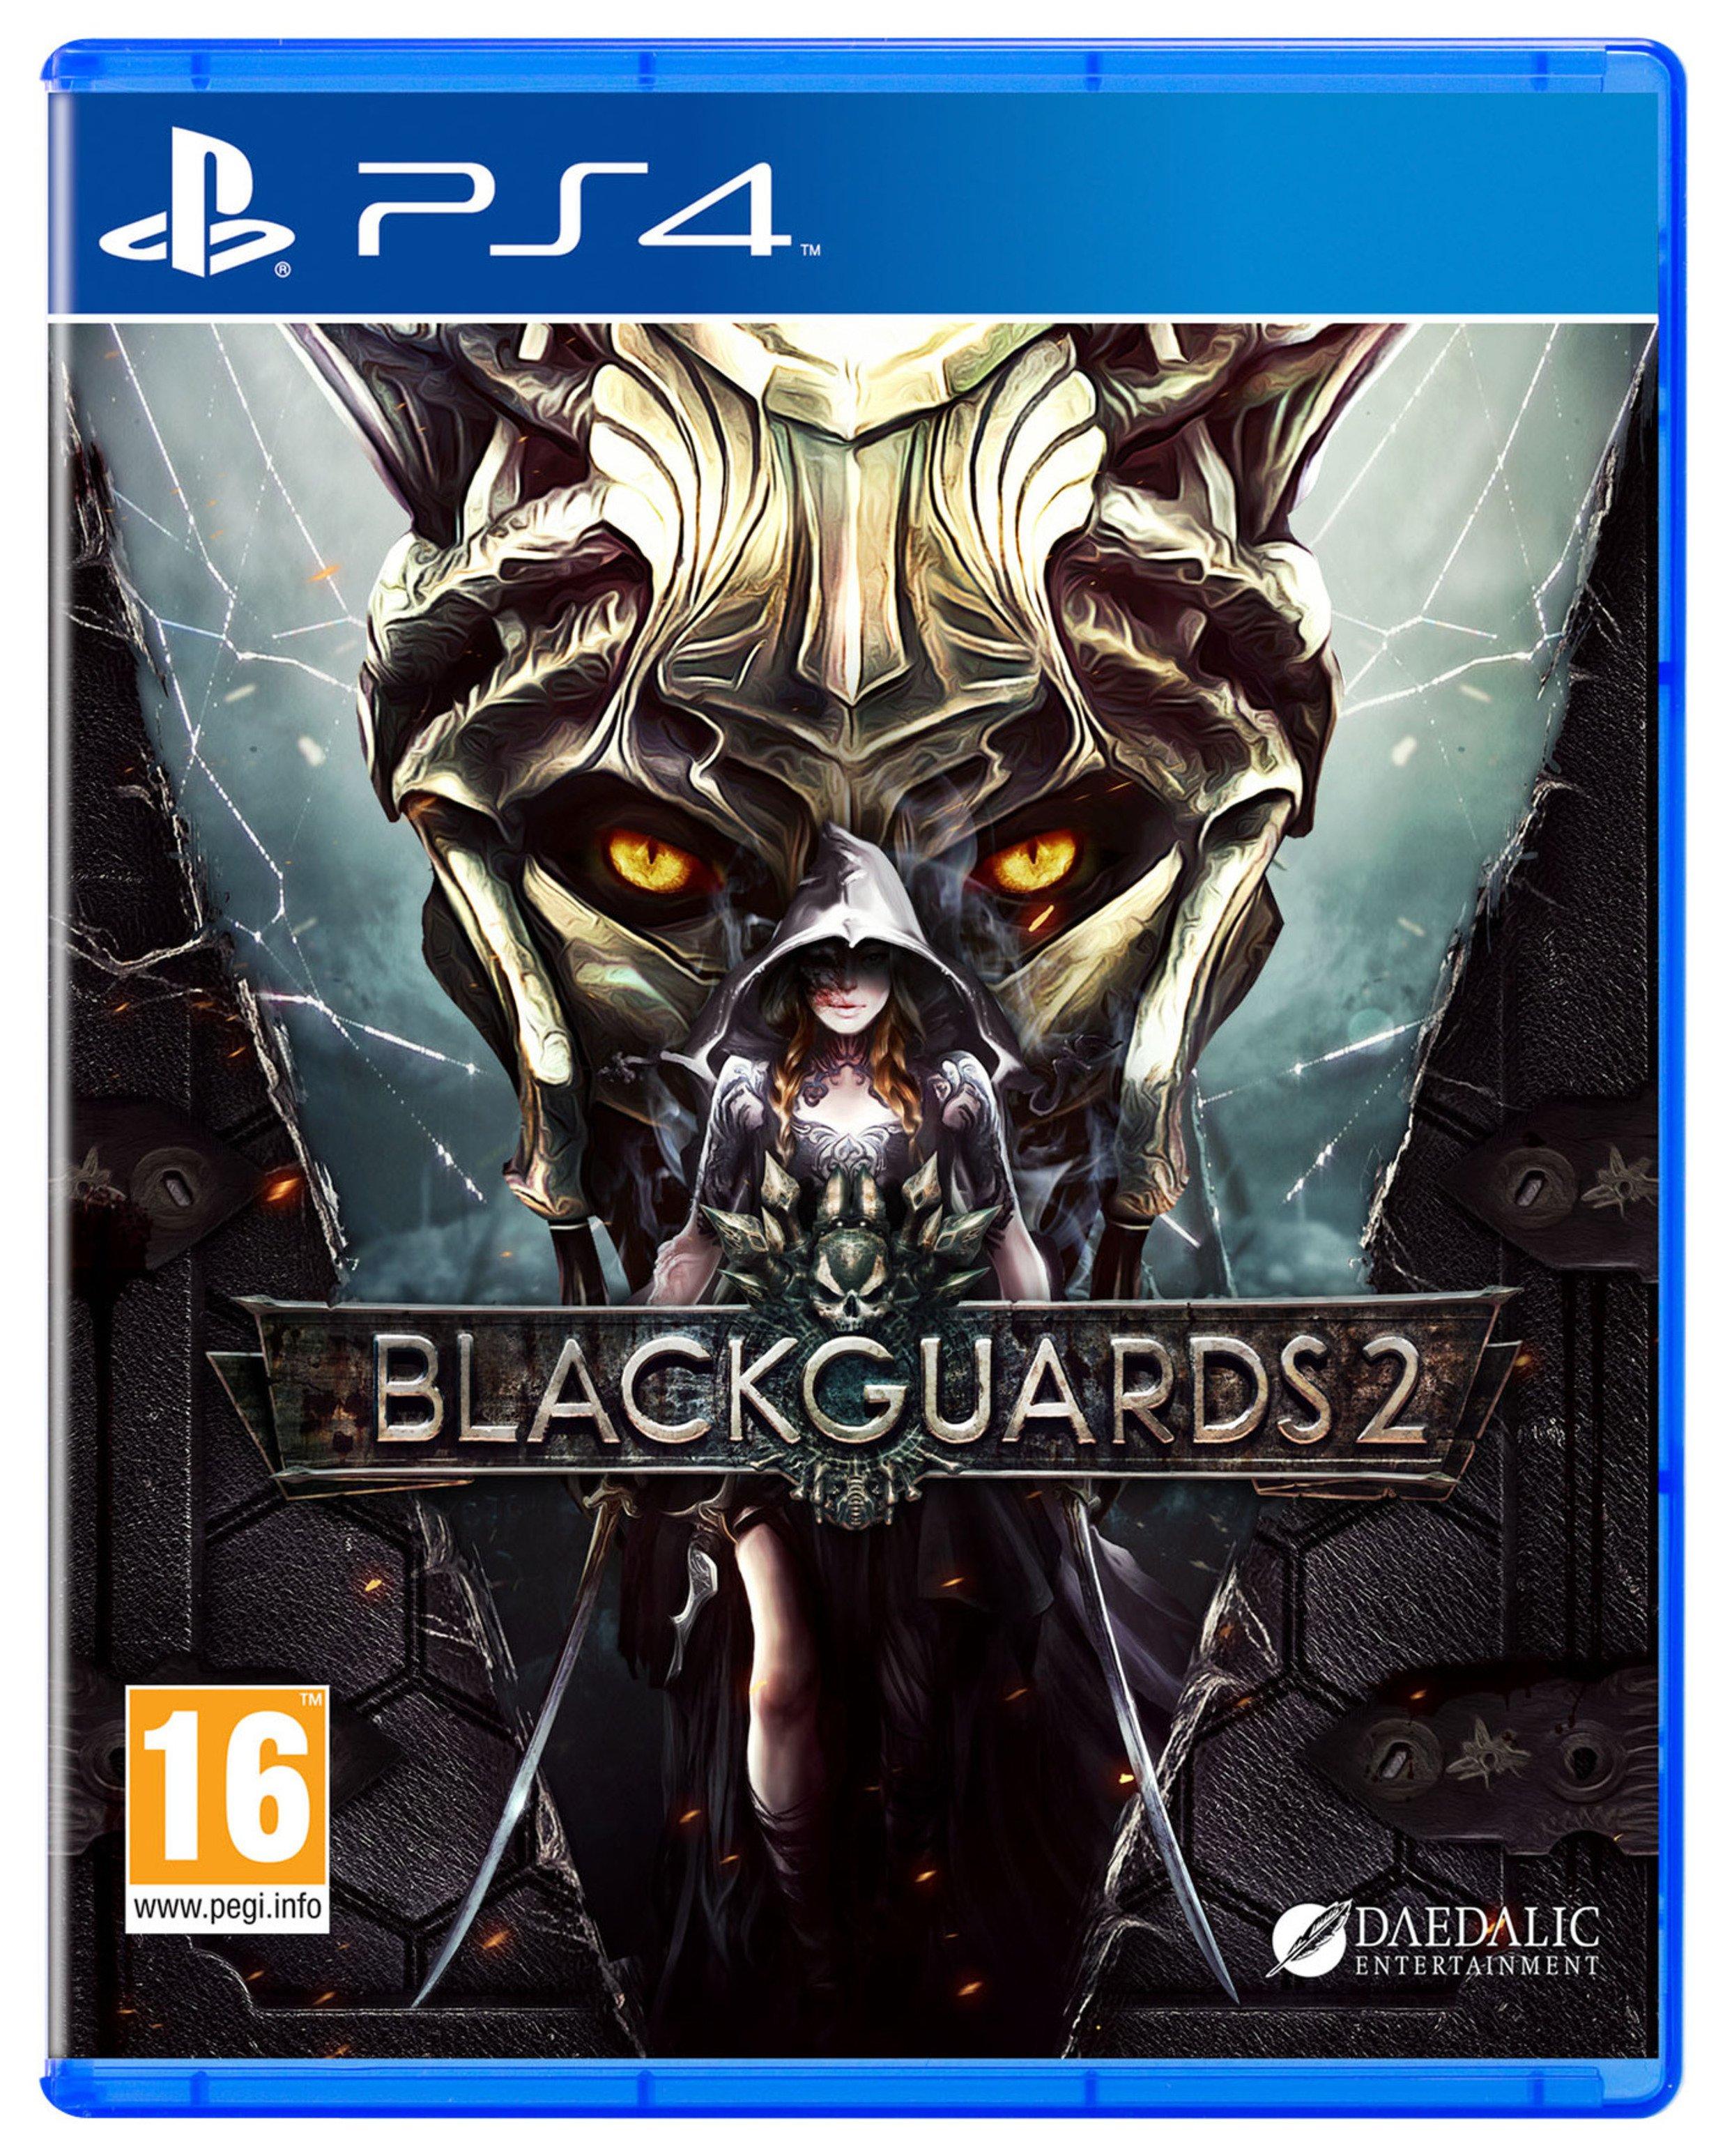 Blackguards 2 PS4 Game